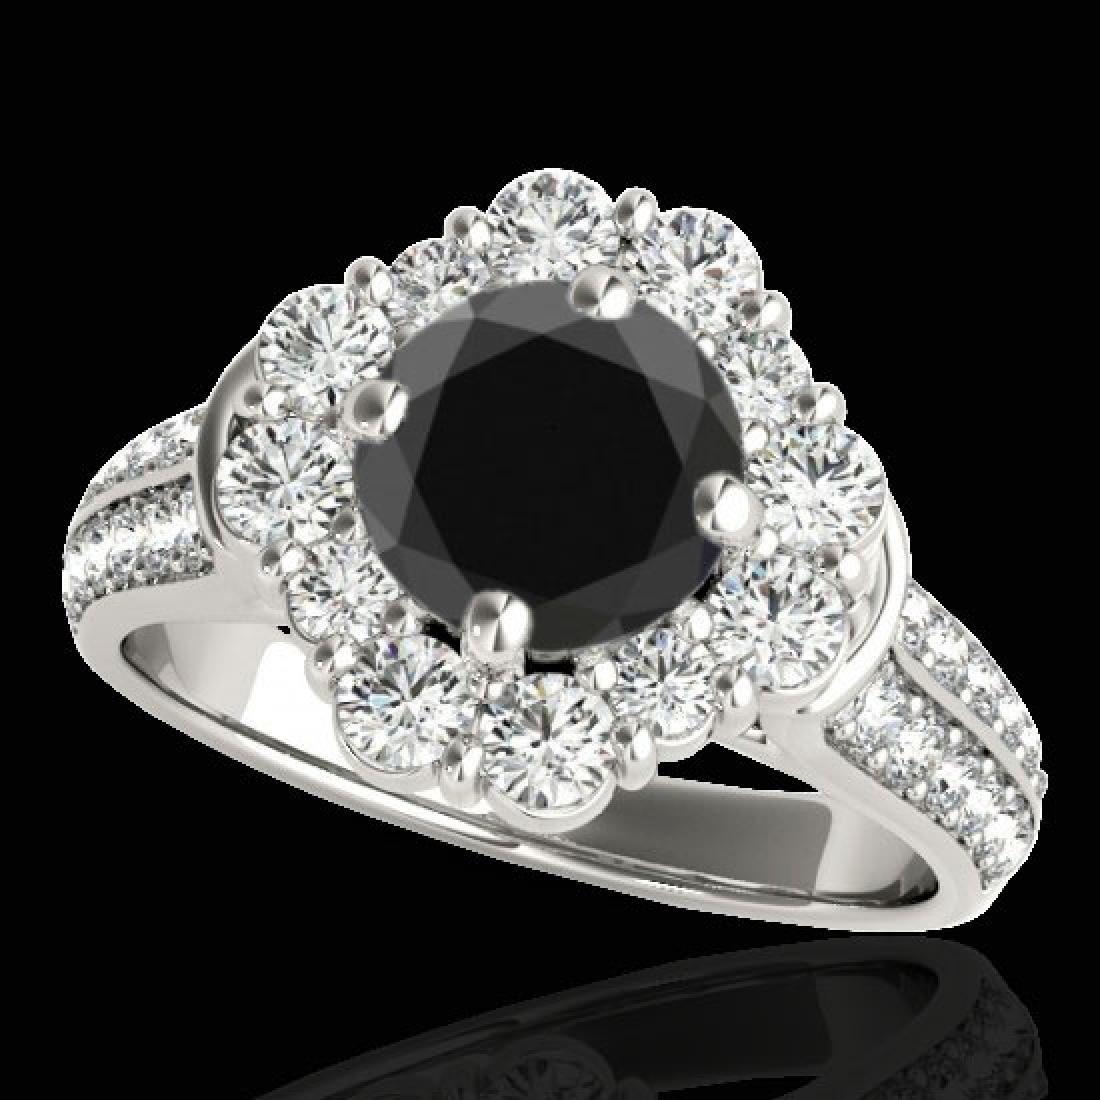 2.81 CTW Certified VS Black Diamond Solitaire Halo Ring